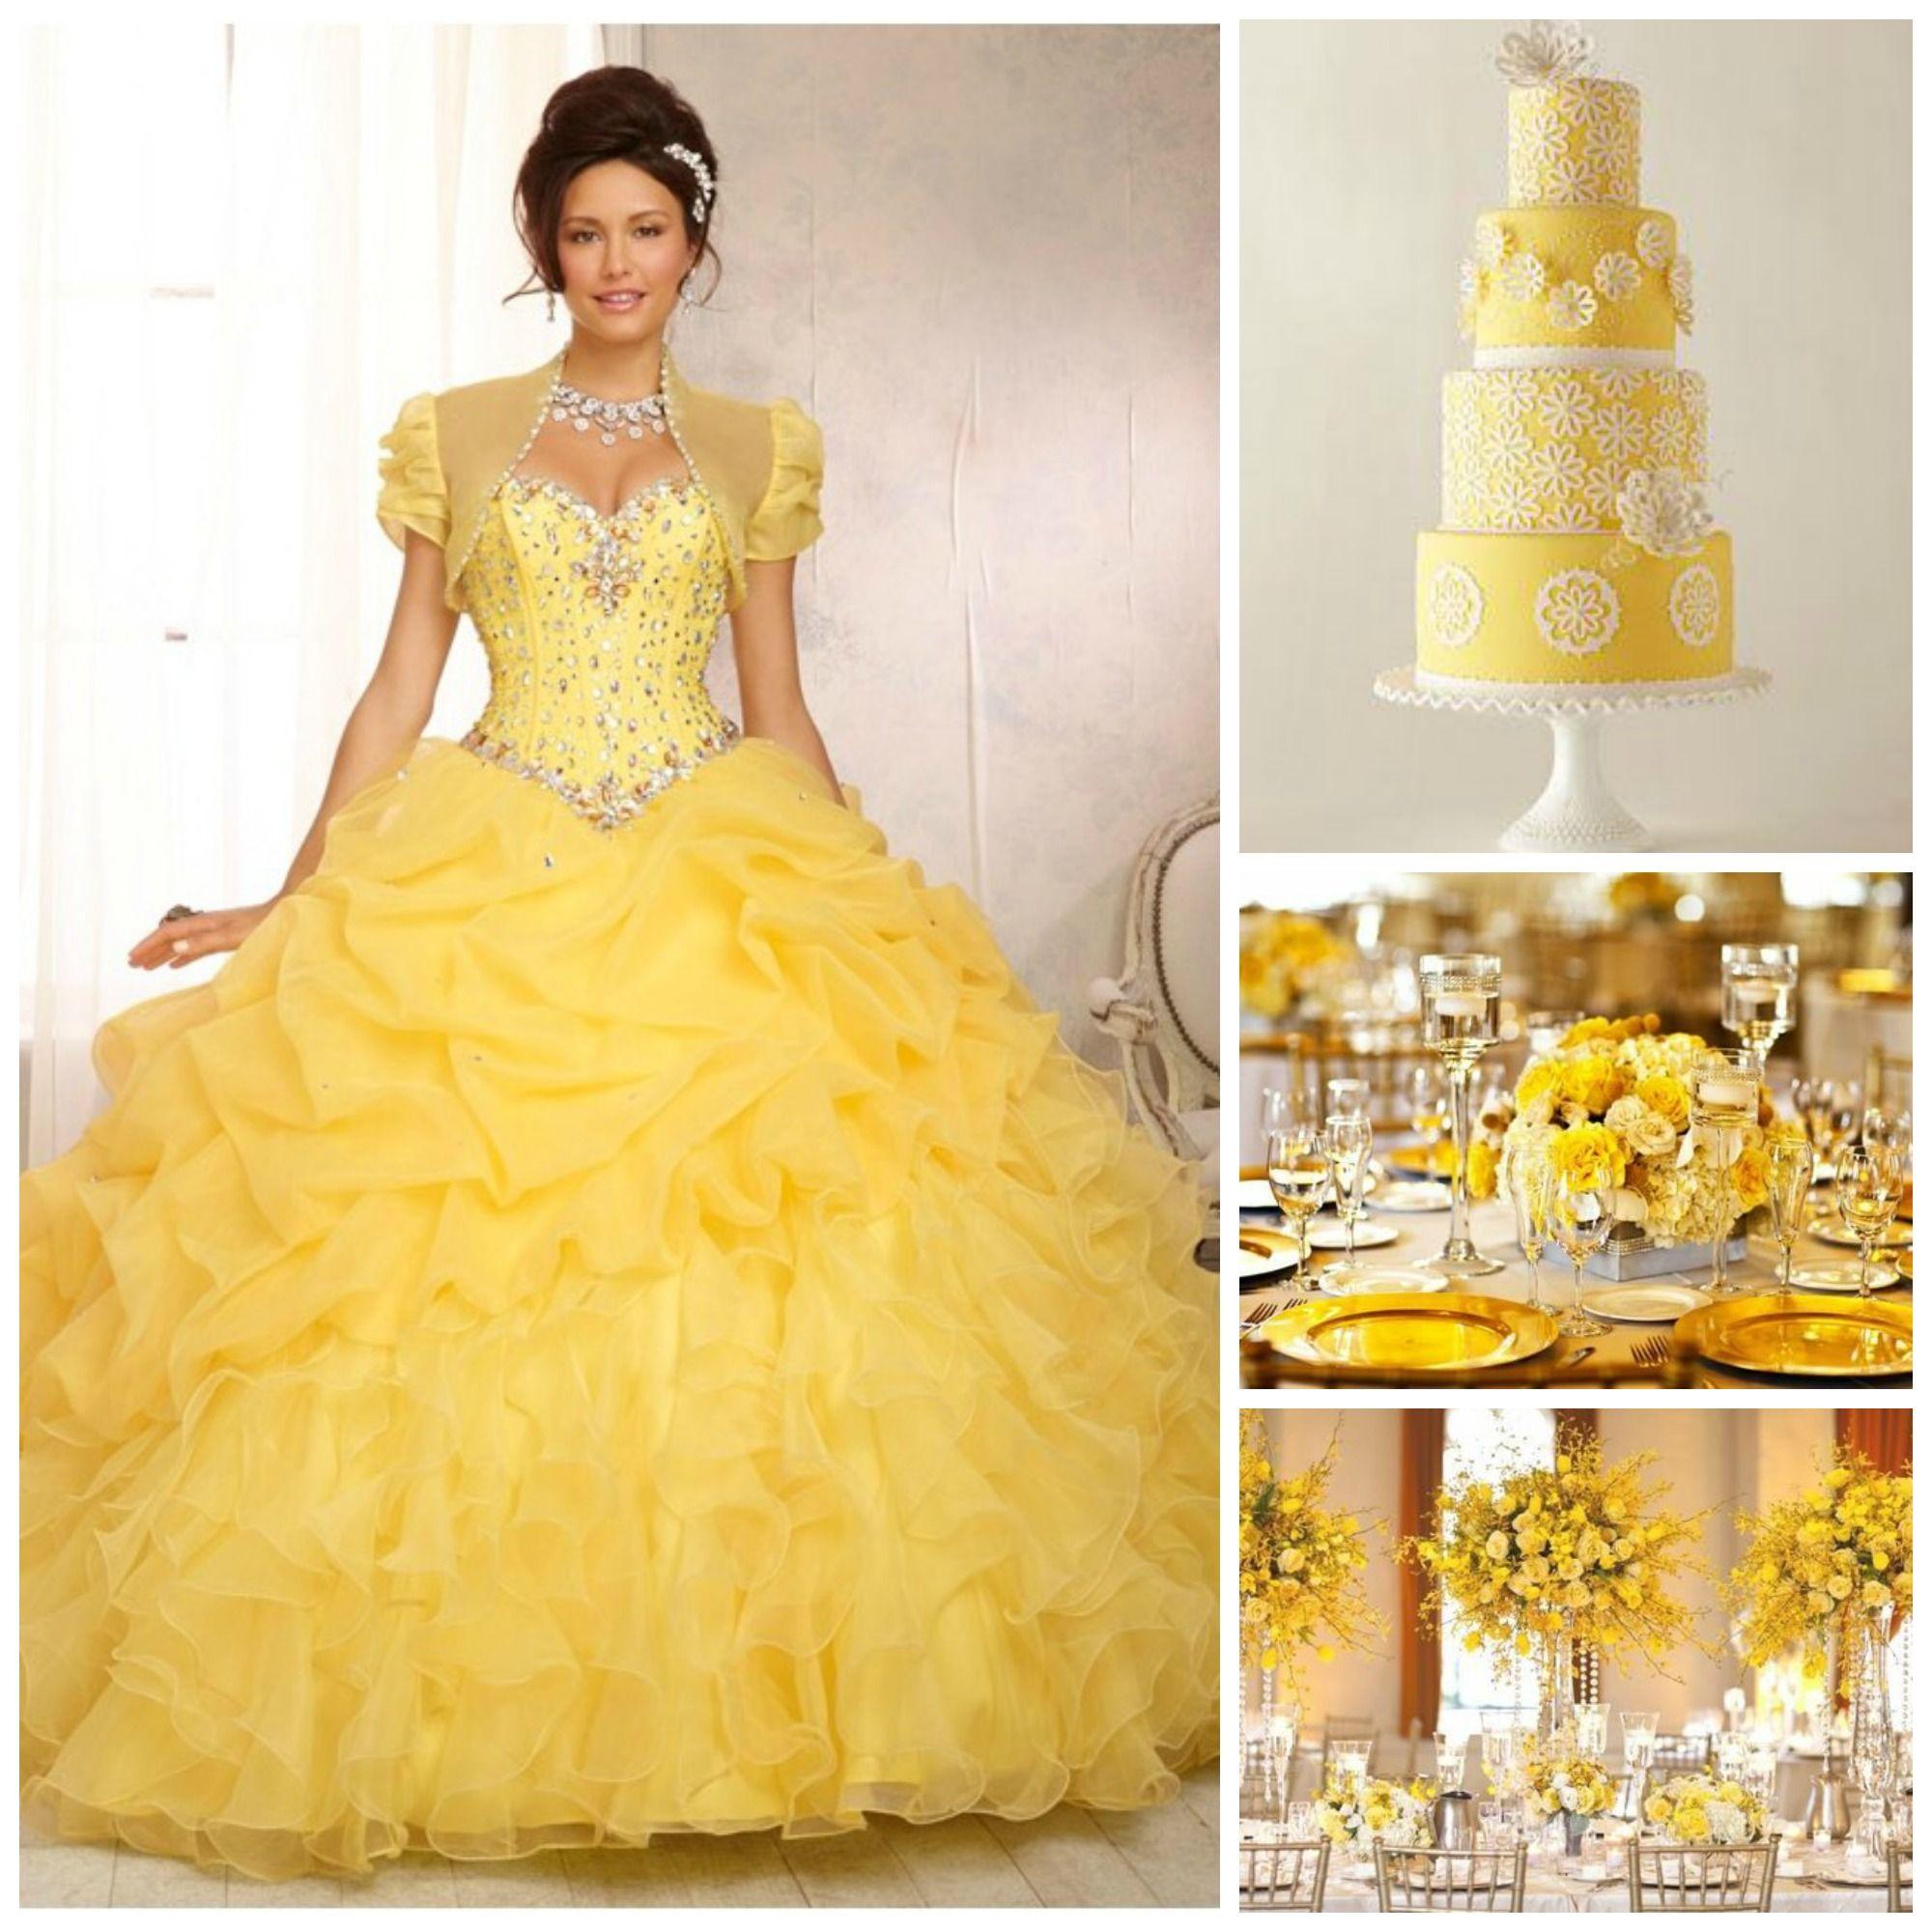 Almeda Mall Prom Dresses